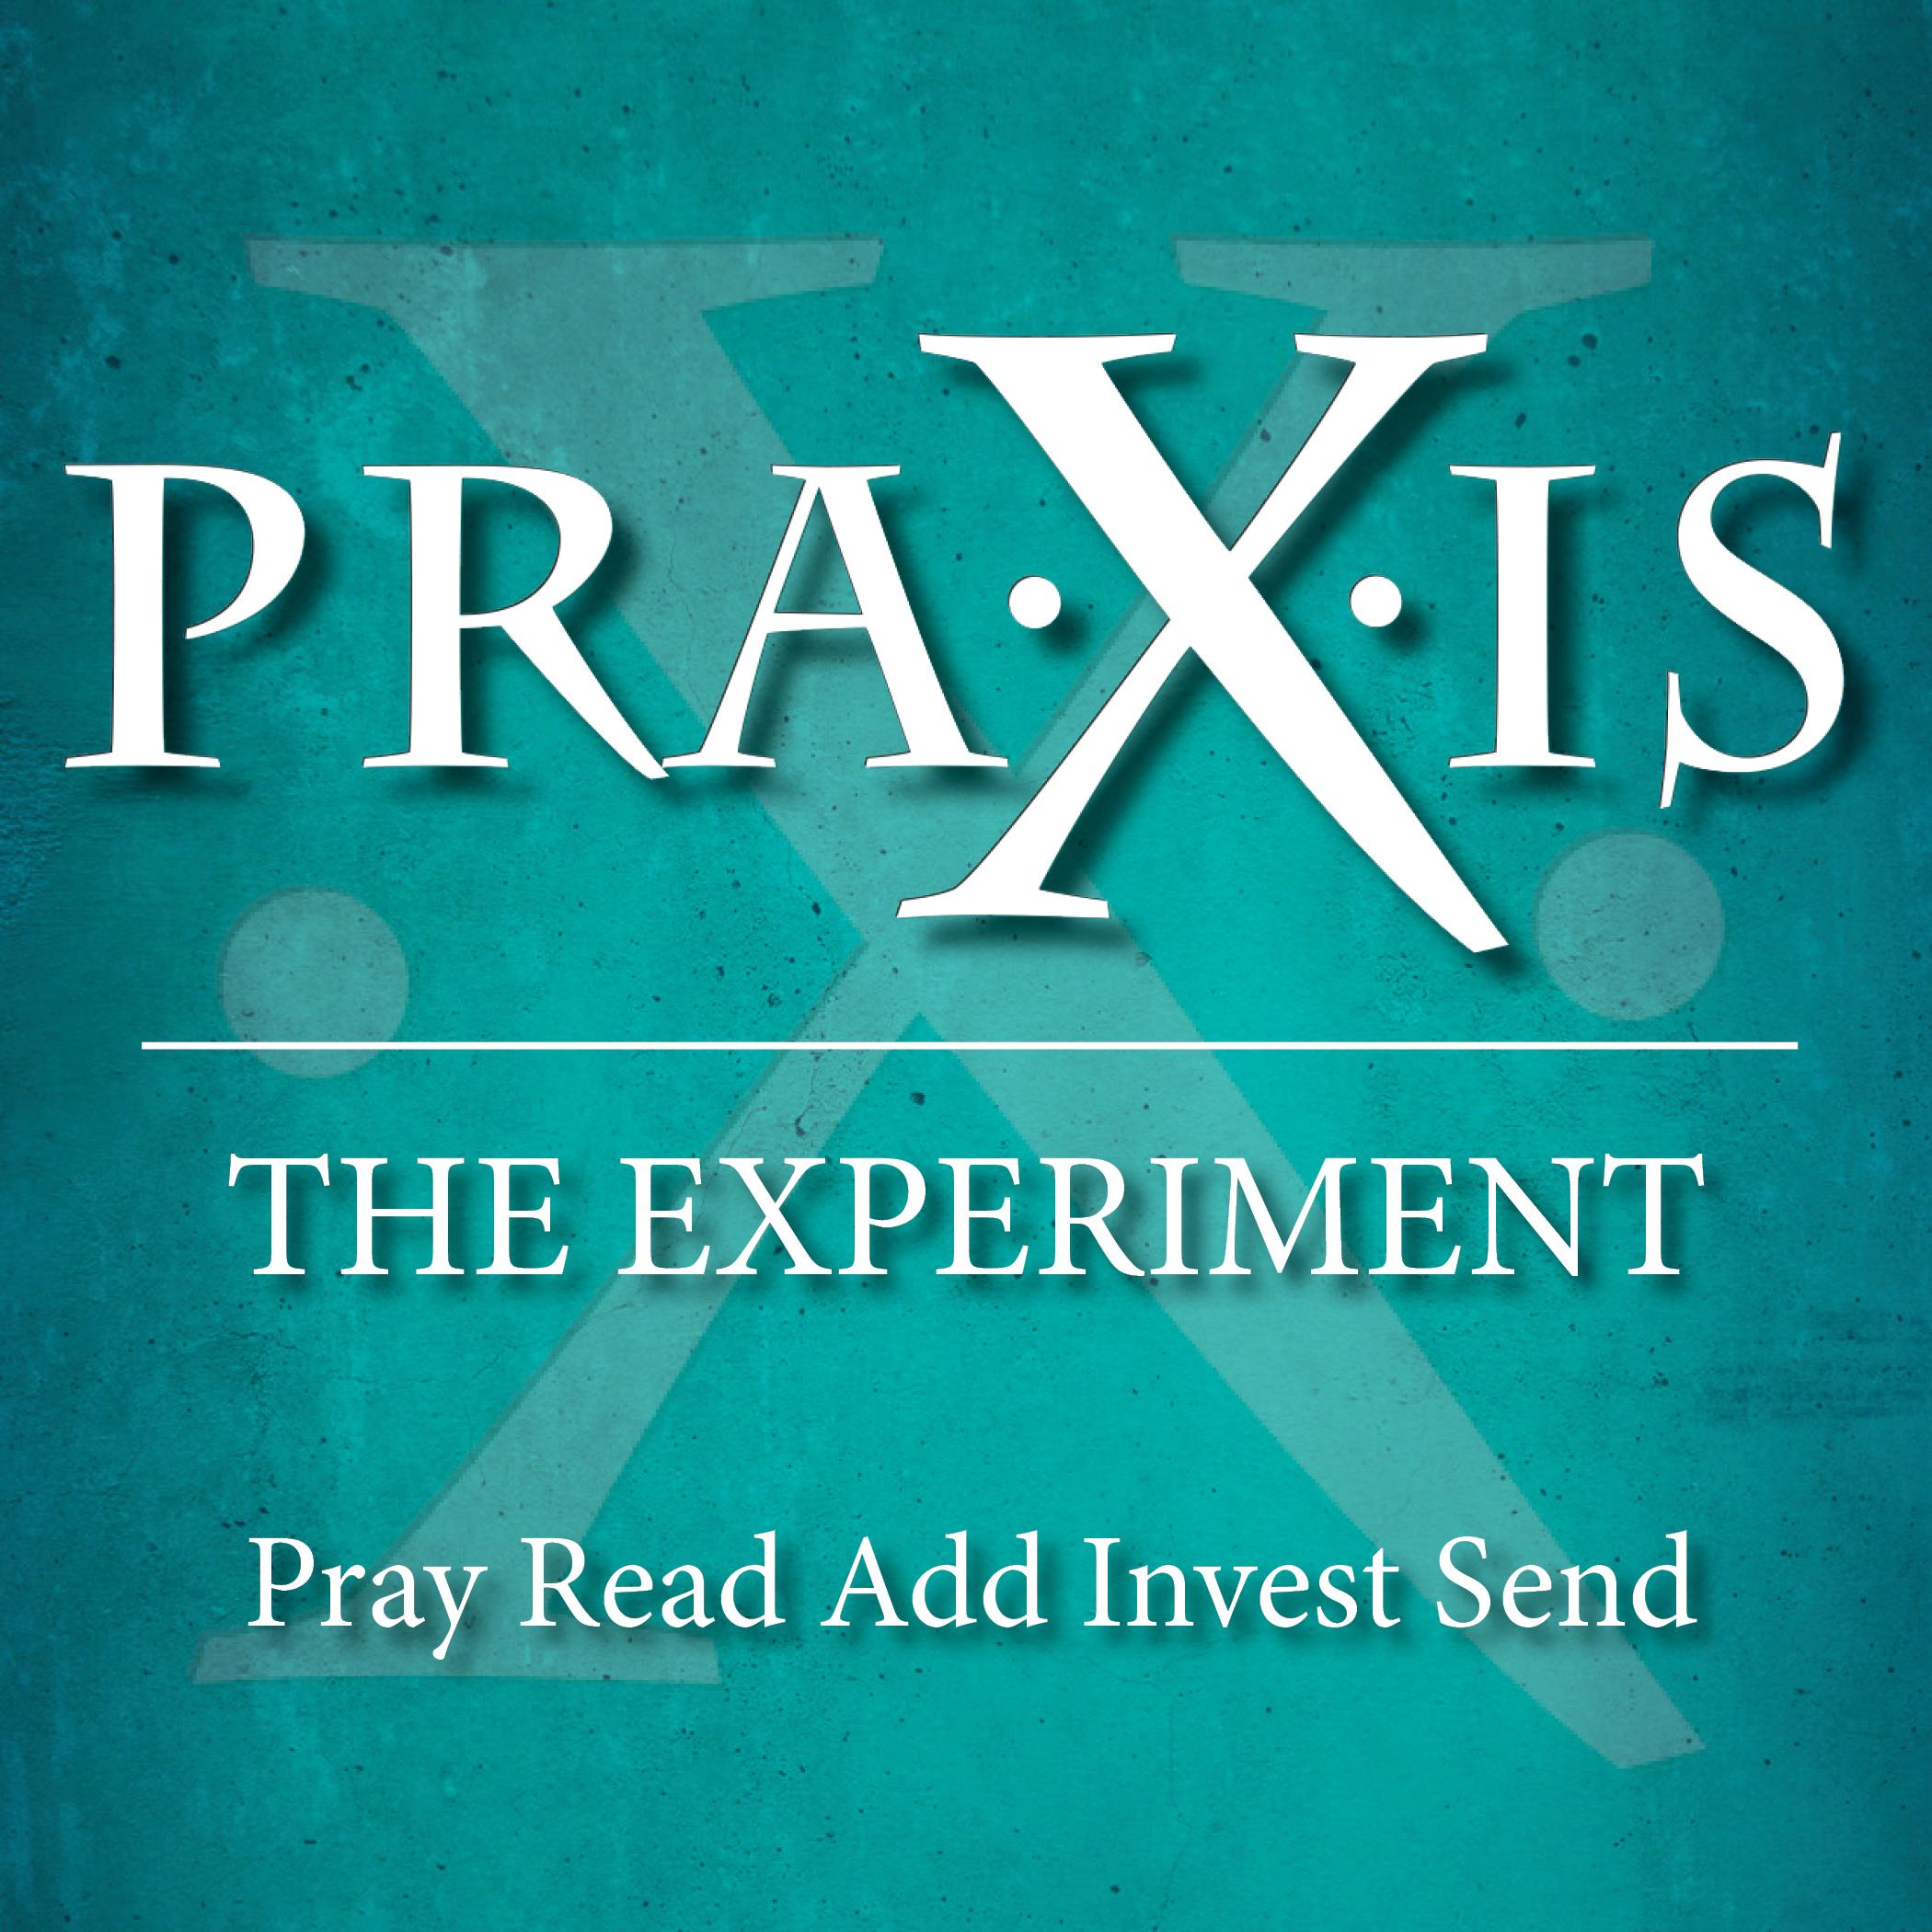 PRAXIS Bulletin Cover Image.jpg